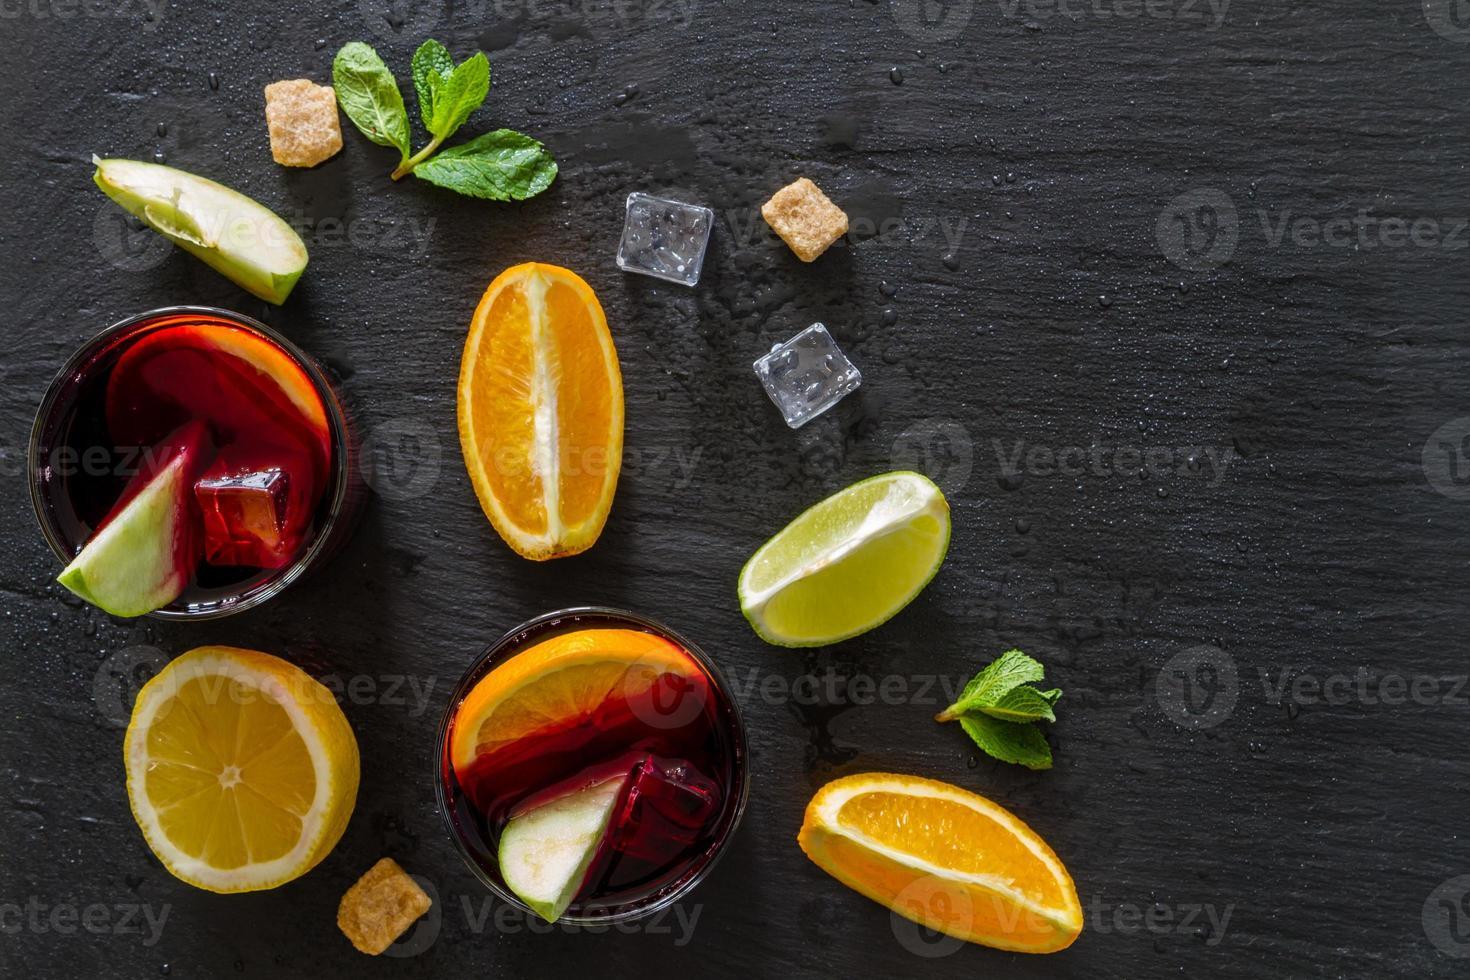 ingredienti per sangria - fette d'arancia, limone e lime, vino foto